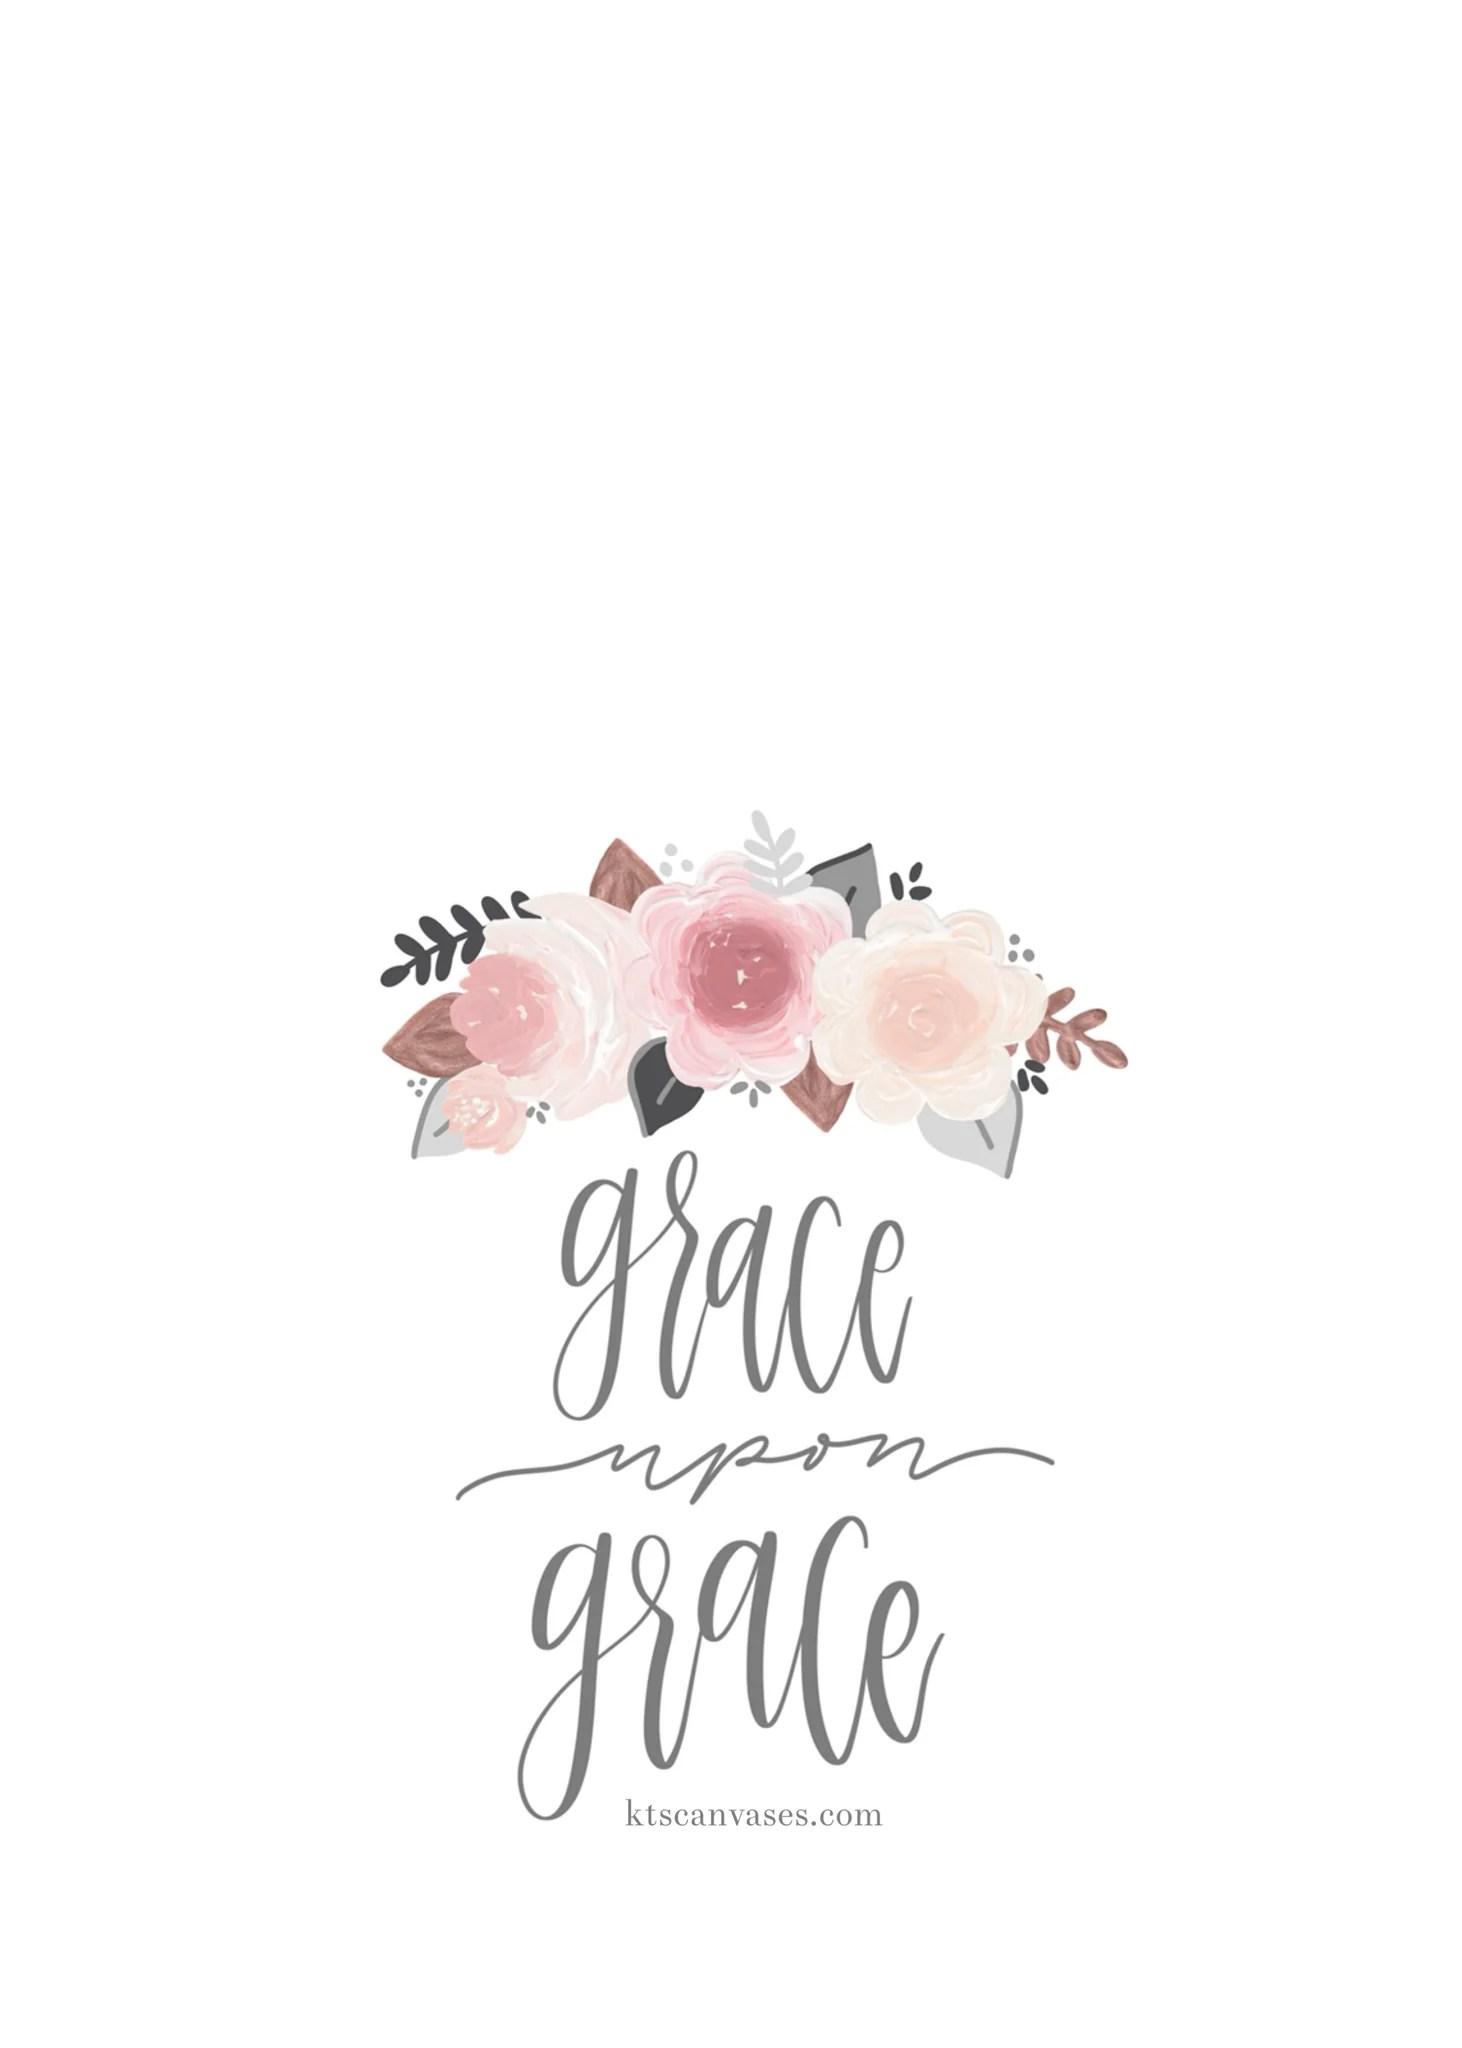 Kate Spade Desktop Wallpaper Fall Grace Upon Grace Wallpaper Kt S Canvases